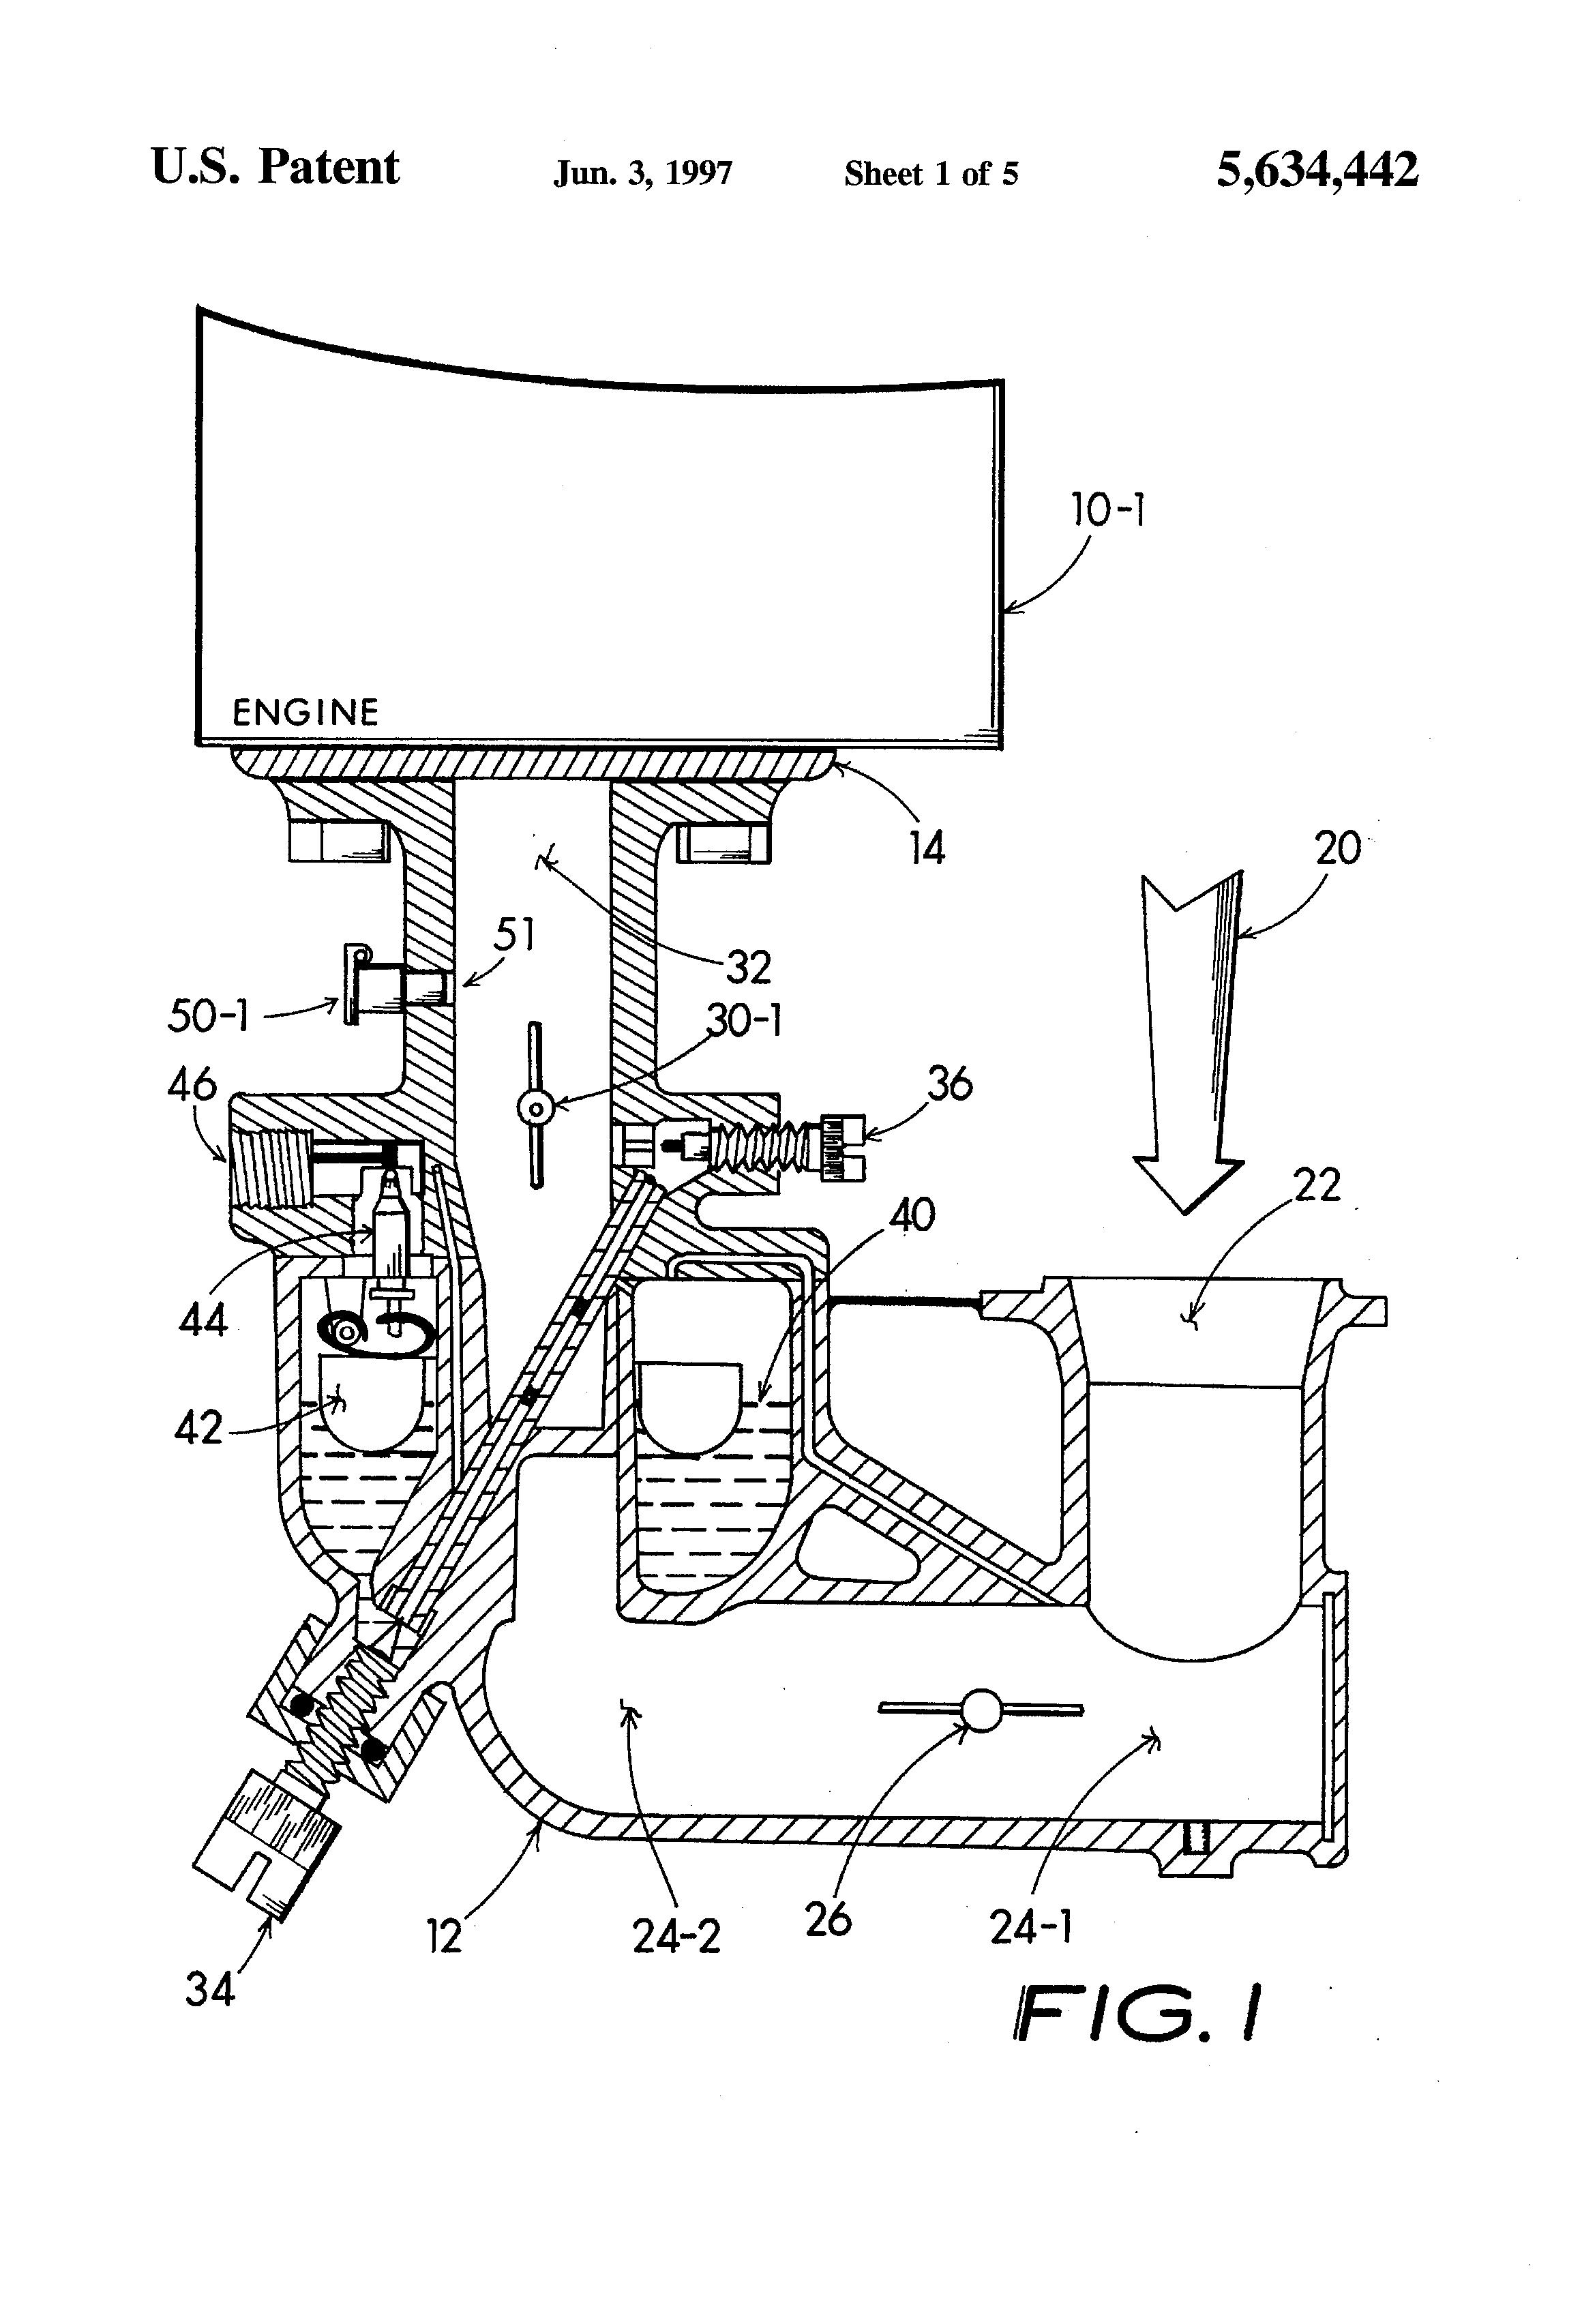 diagram of internal combustion engine firing